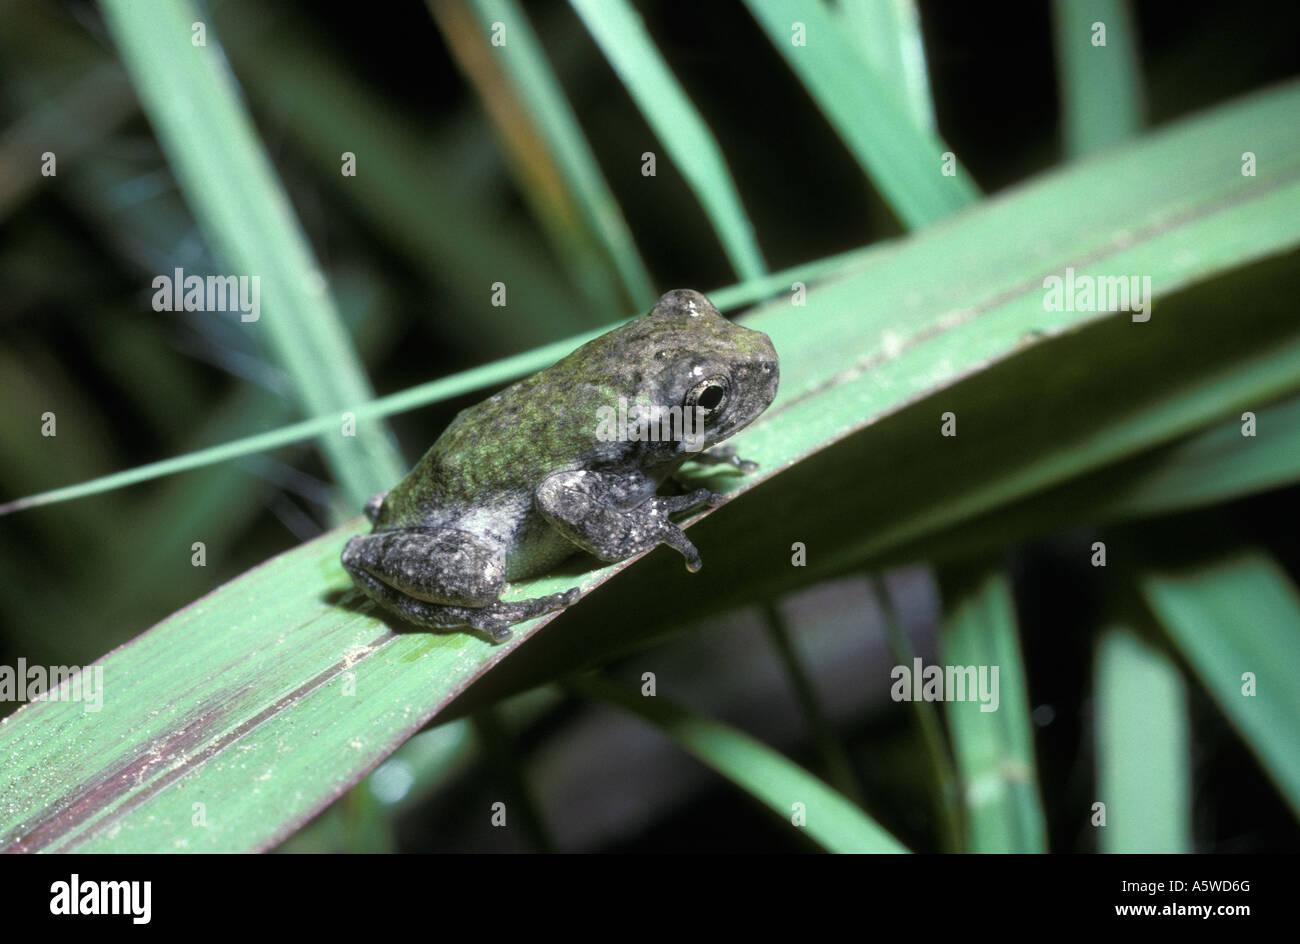 Gray tree frog Hyla chrysocelis Hylidae on vegetation beside a forest river S Carolina USA - Stock Image